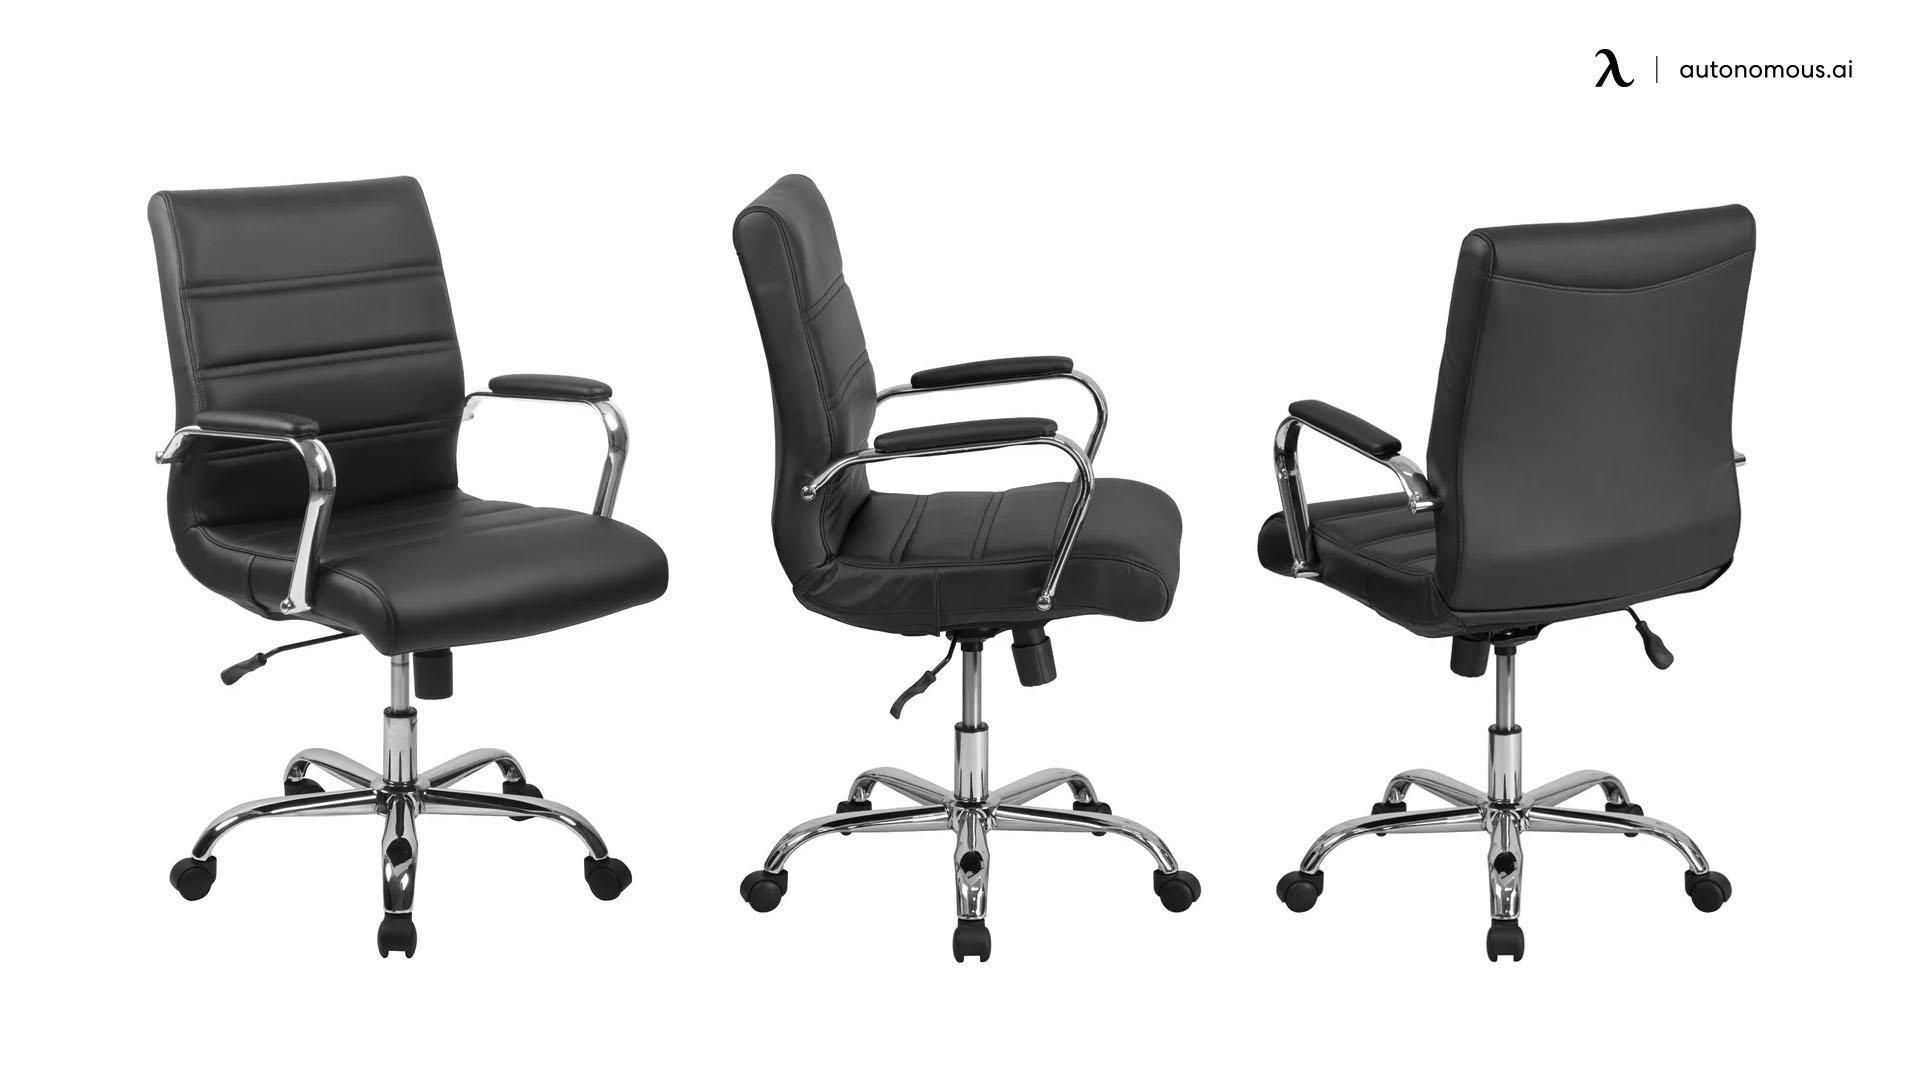 Leaman Ergonomic Executive Chair